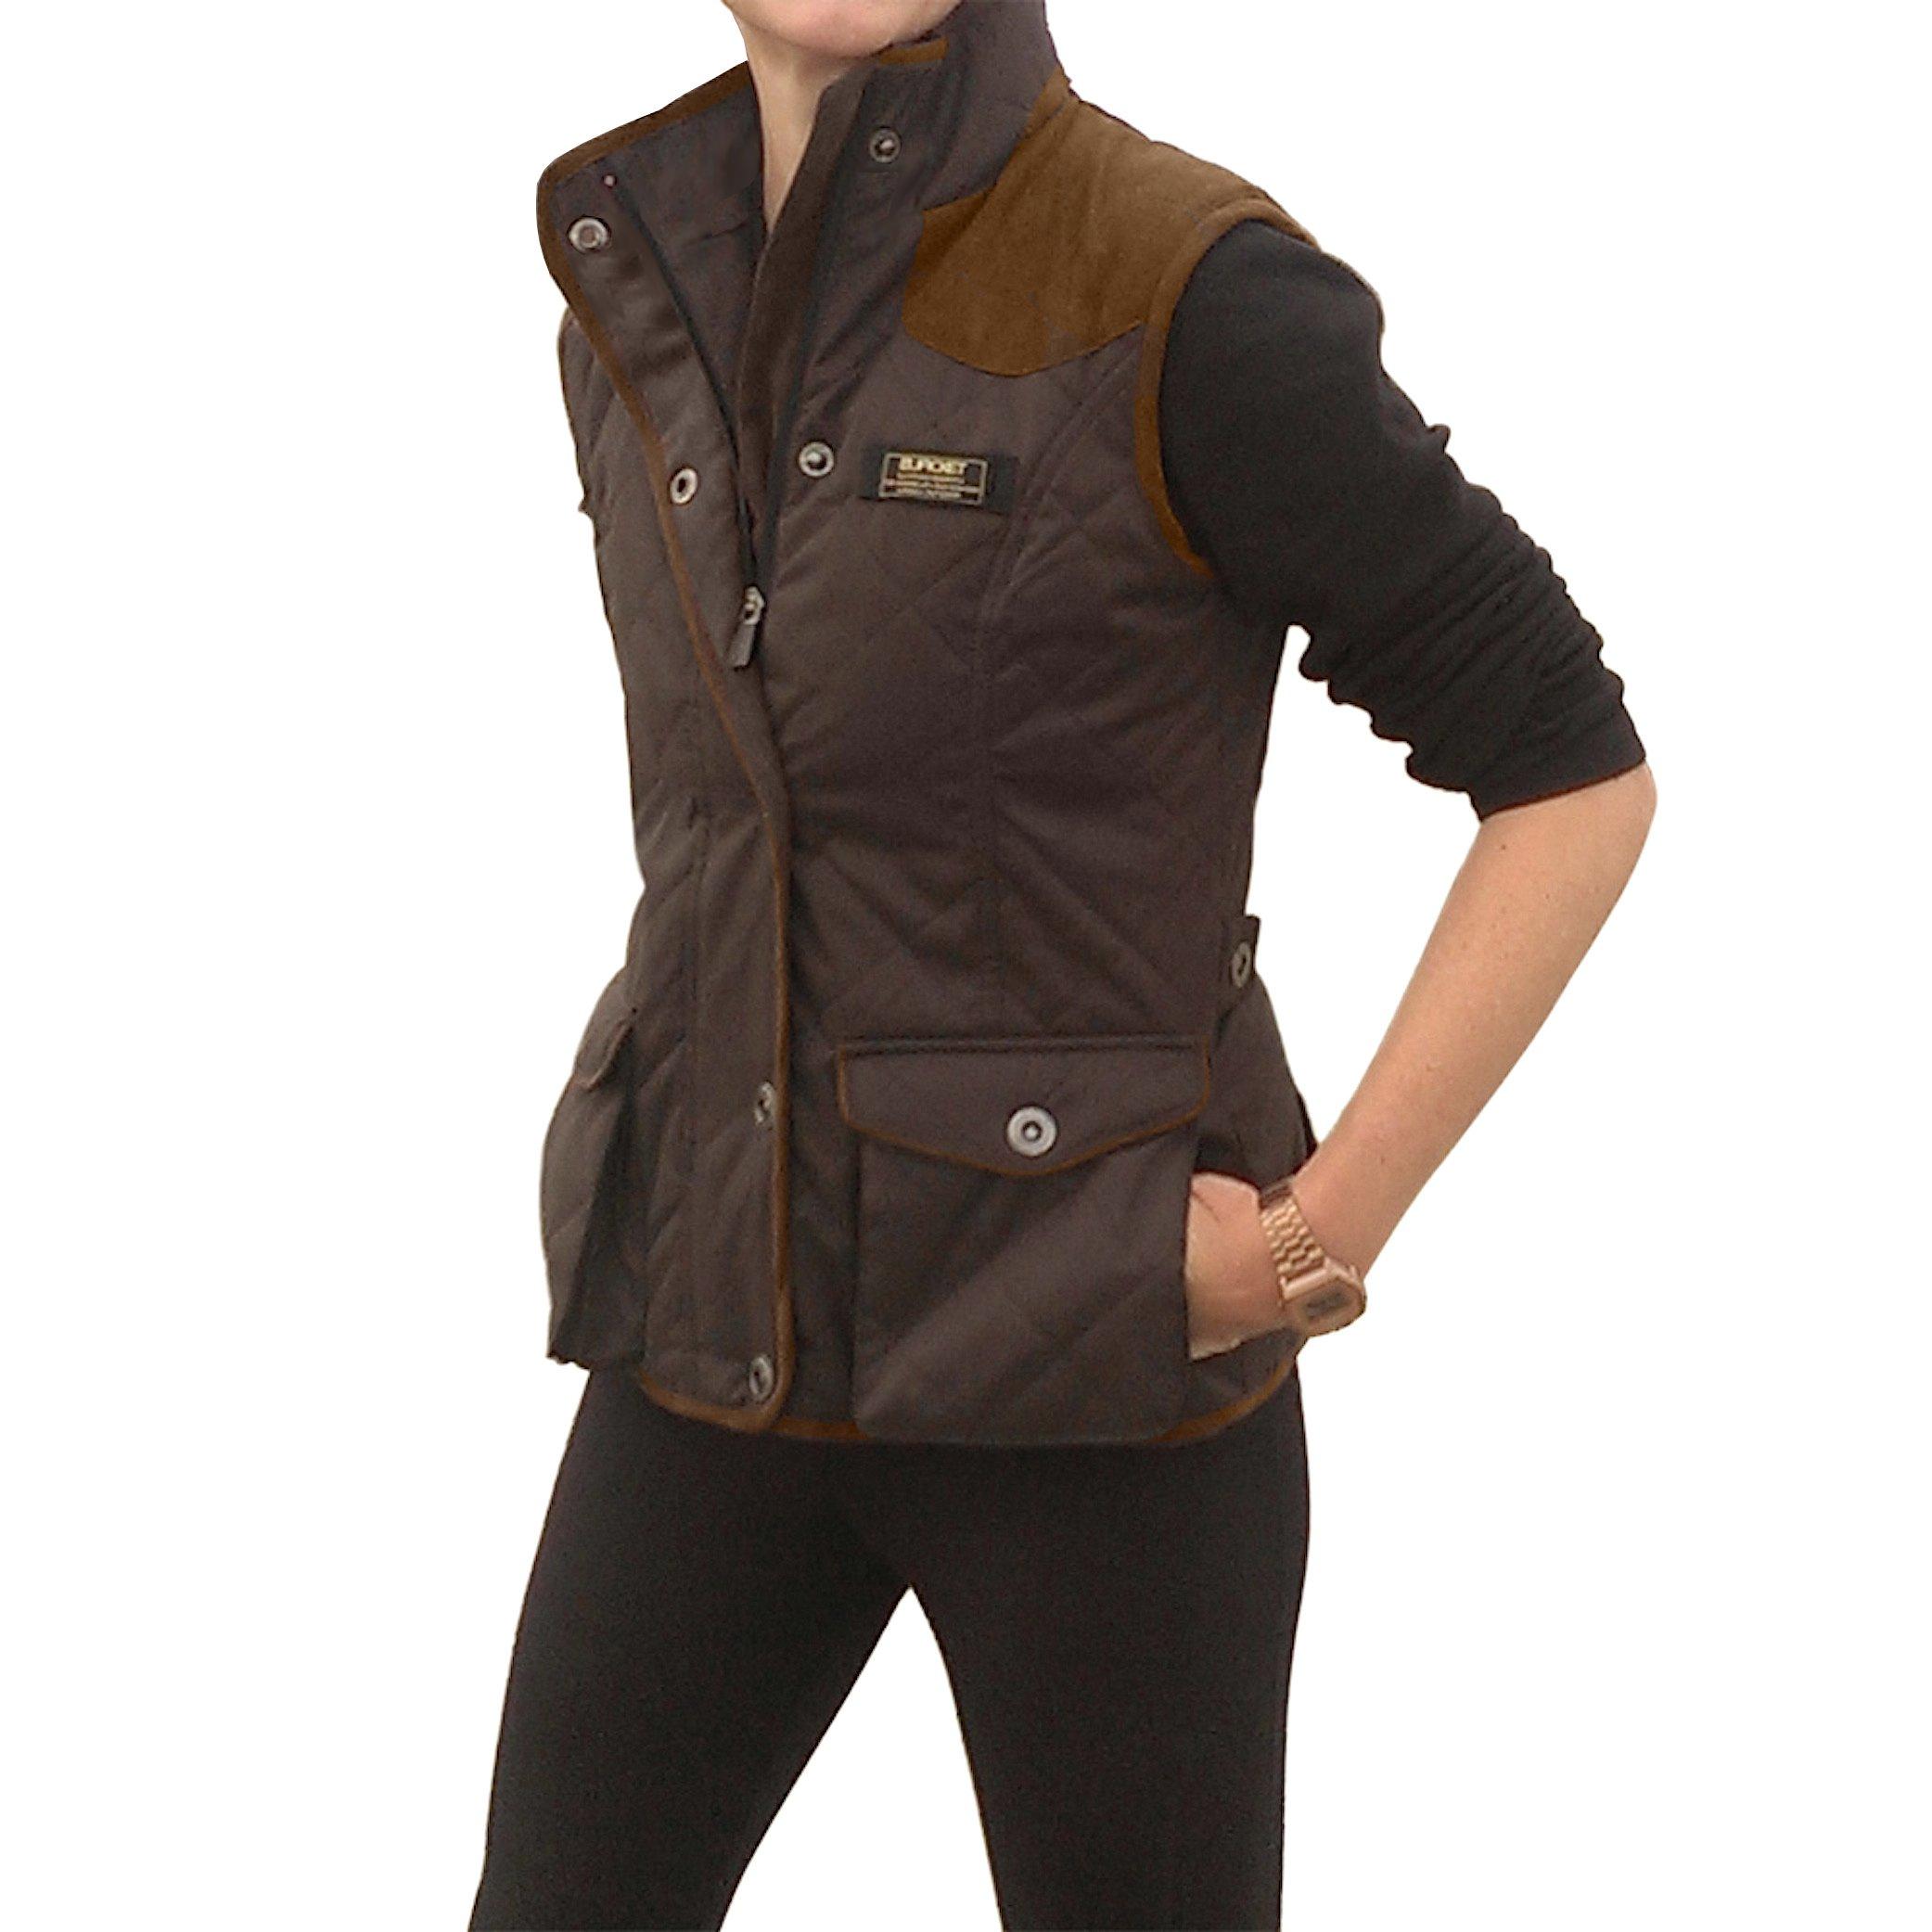 Baviera Women's Slimming Stretch Vest Adjustable Waist with Pockets (Large, Brown)